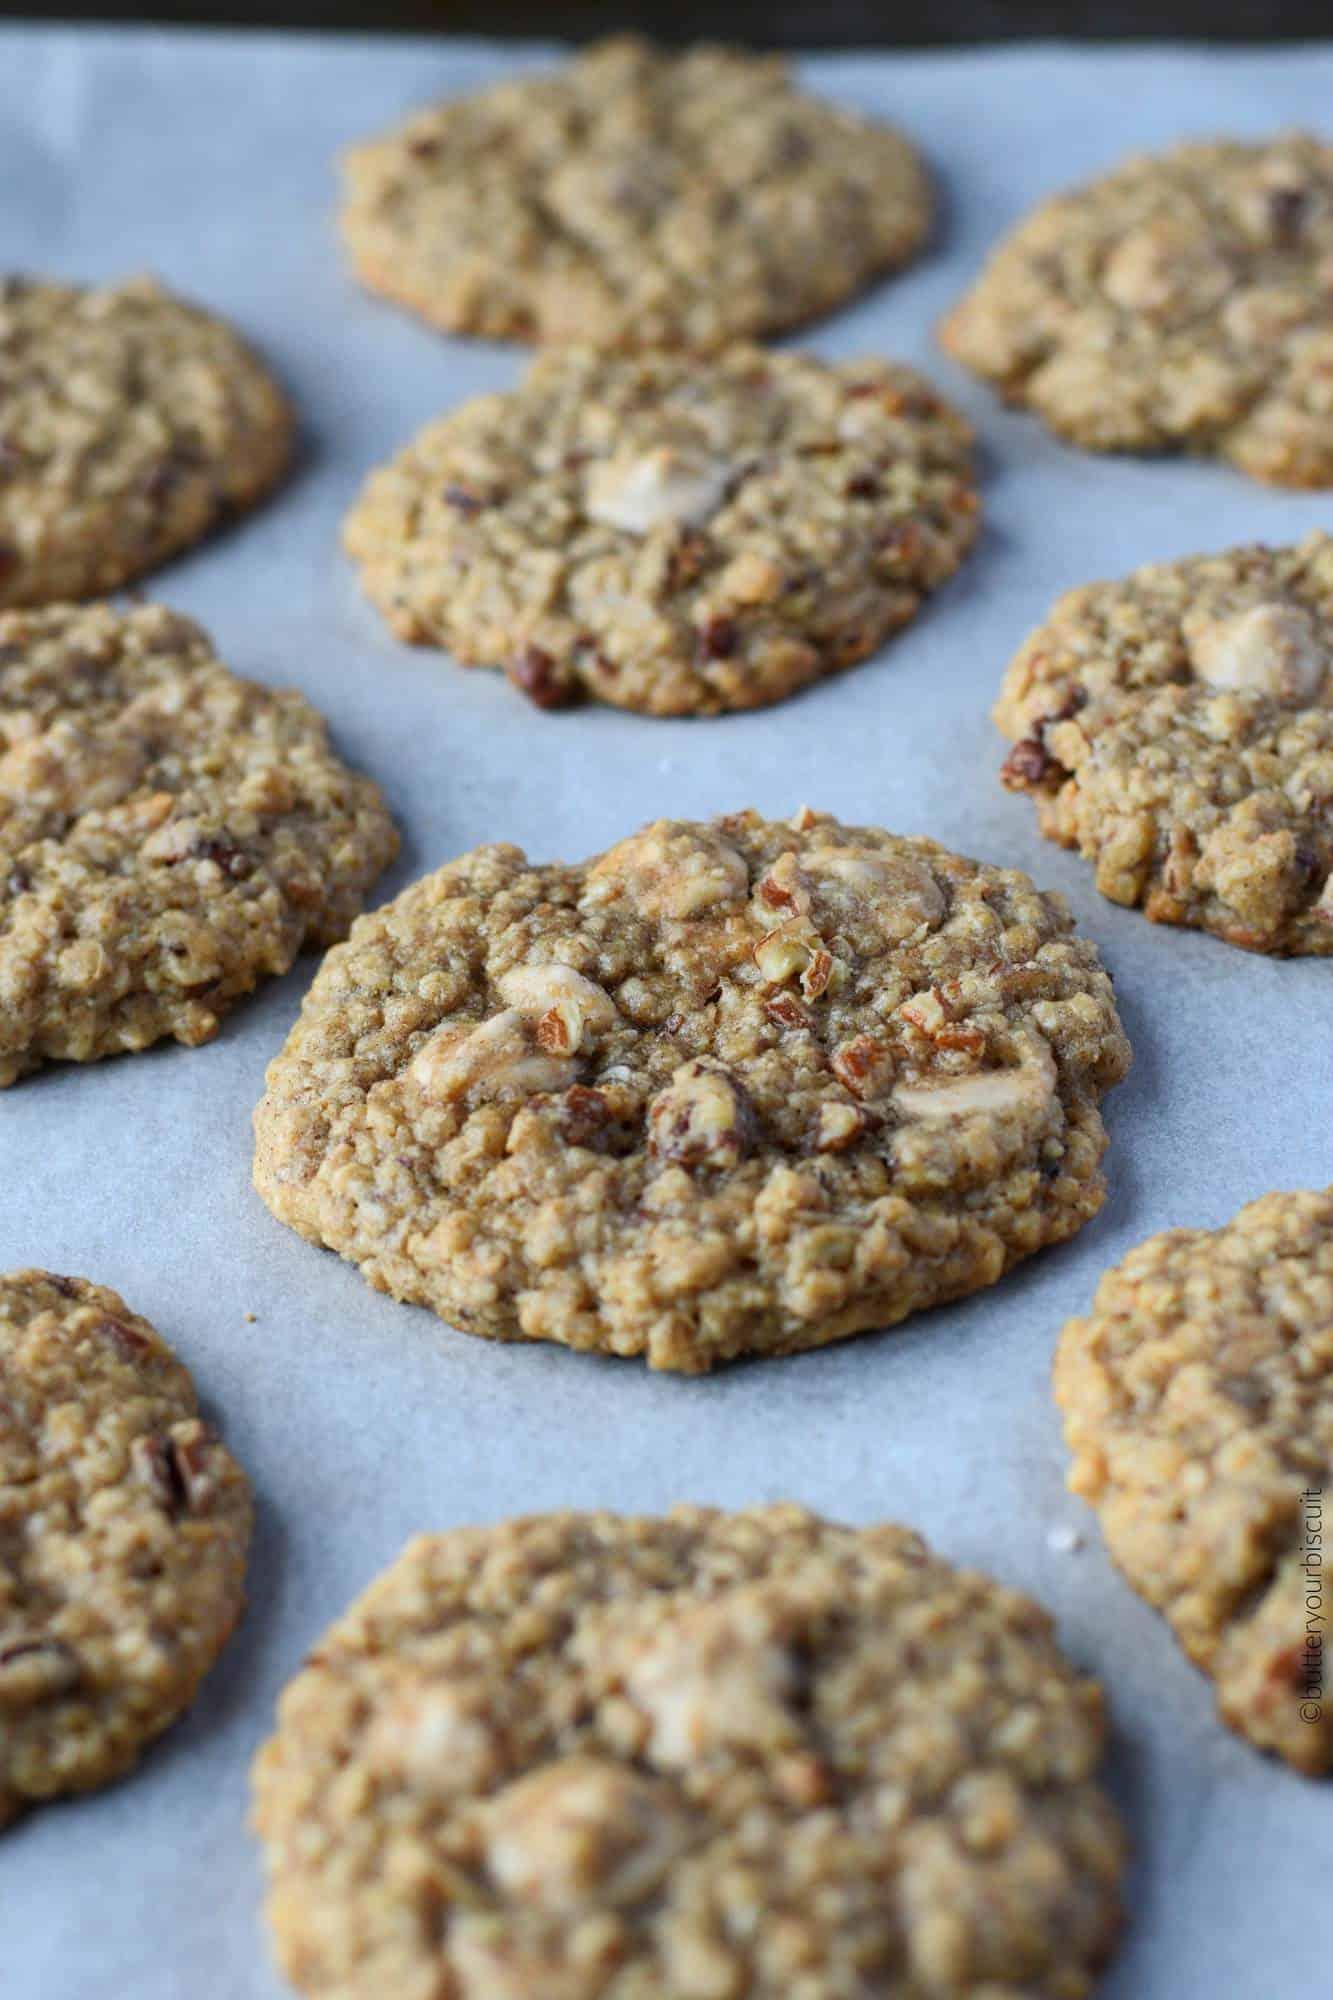 Caramel Pecan Oatmeal cookies on a baking sheet